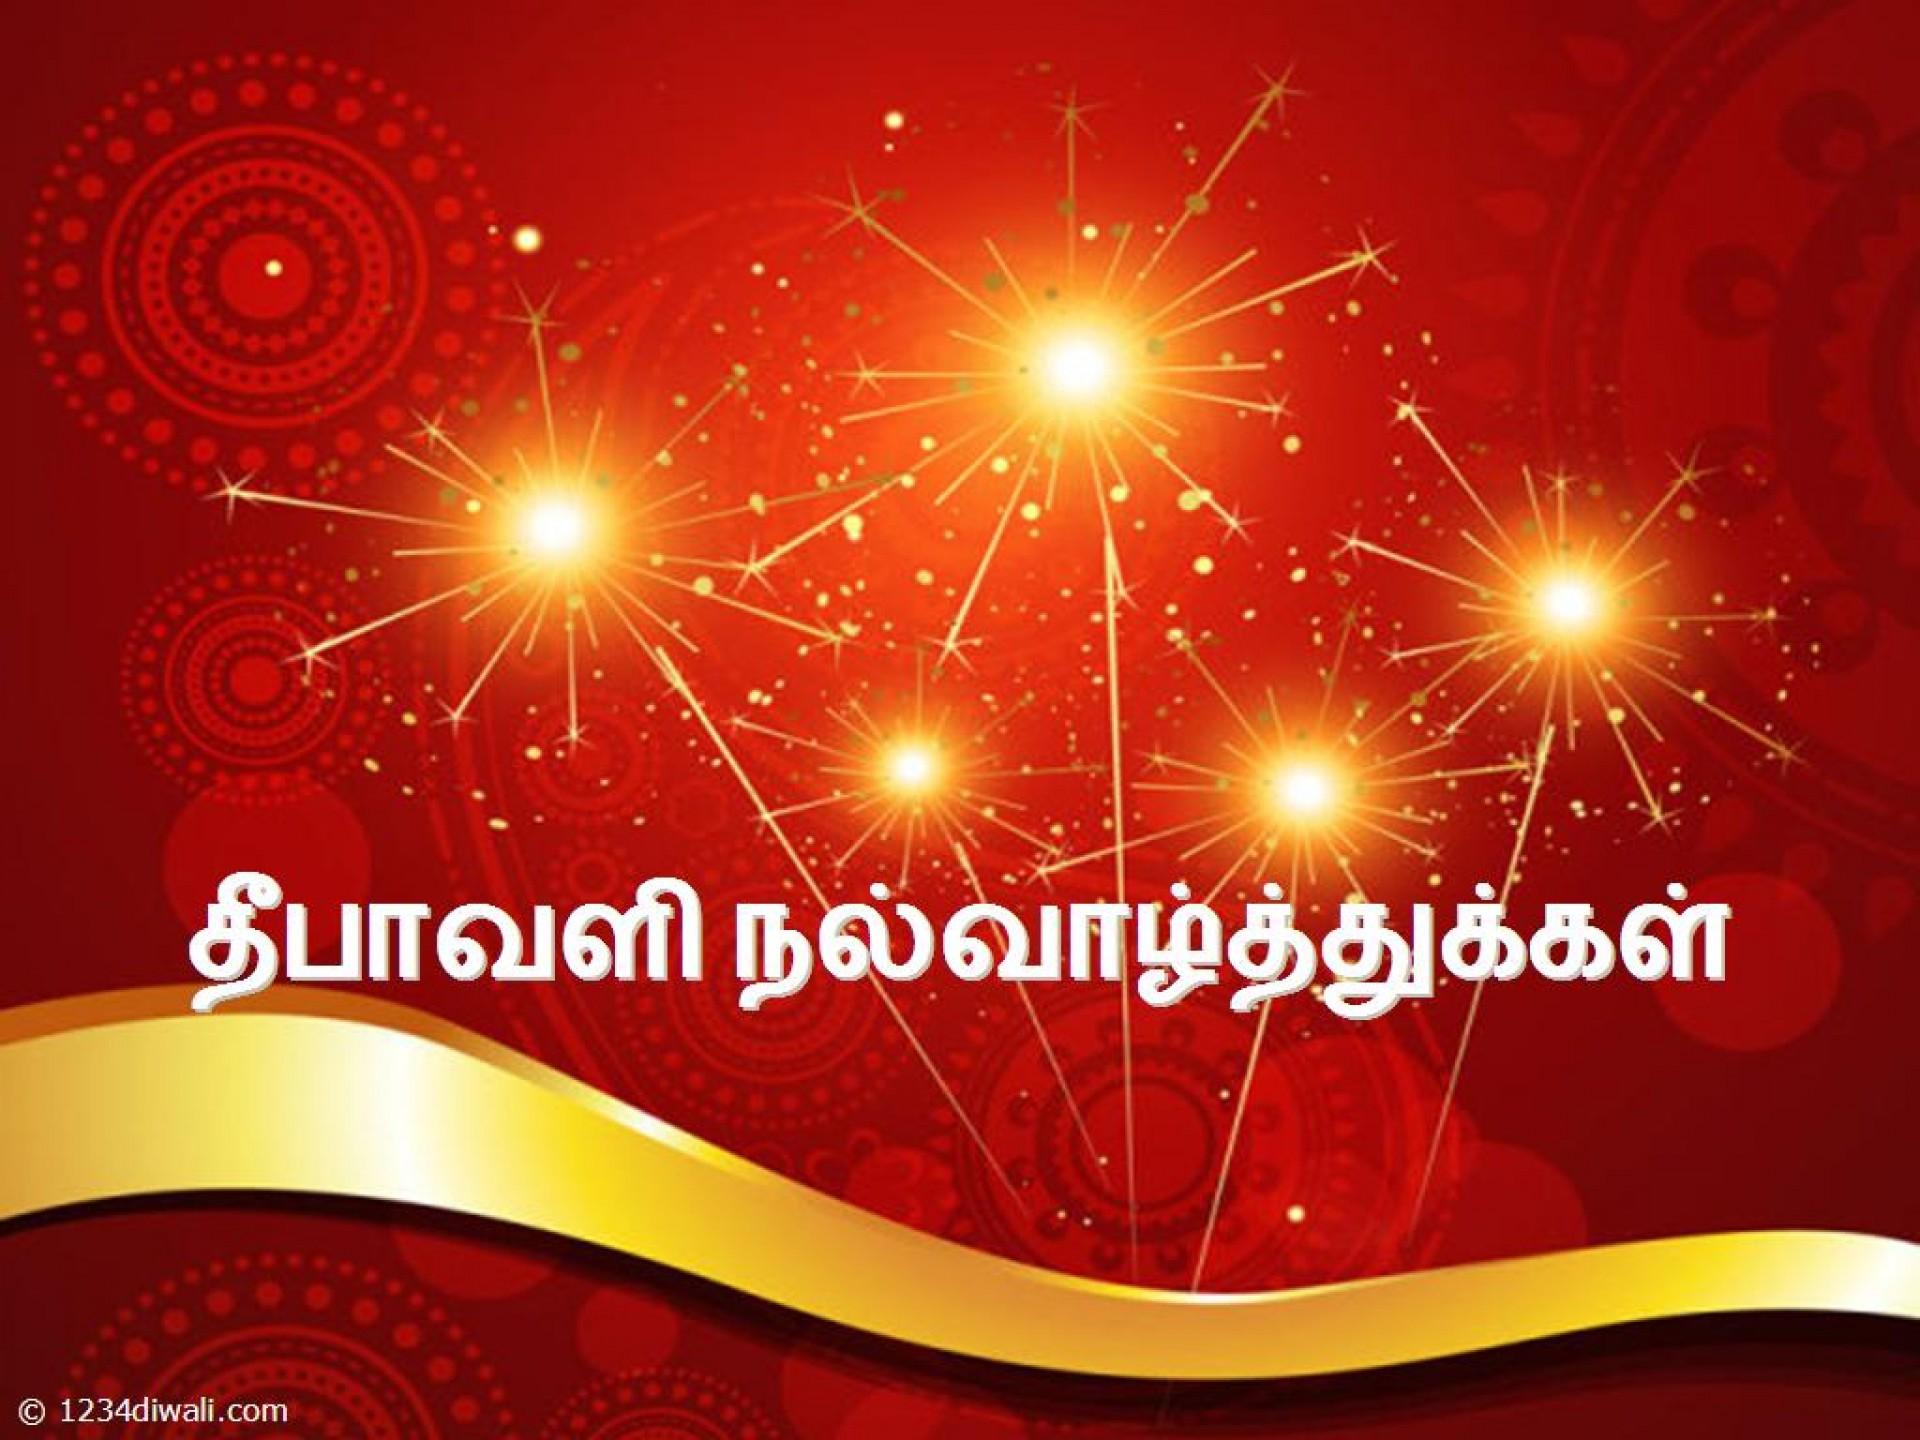 025 Diwali Wishes In Tamil Essay Example Deepavali Unbelievable Festival Christmas Language 1920